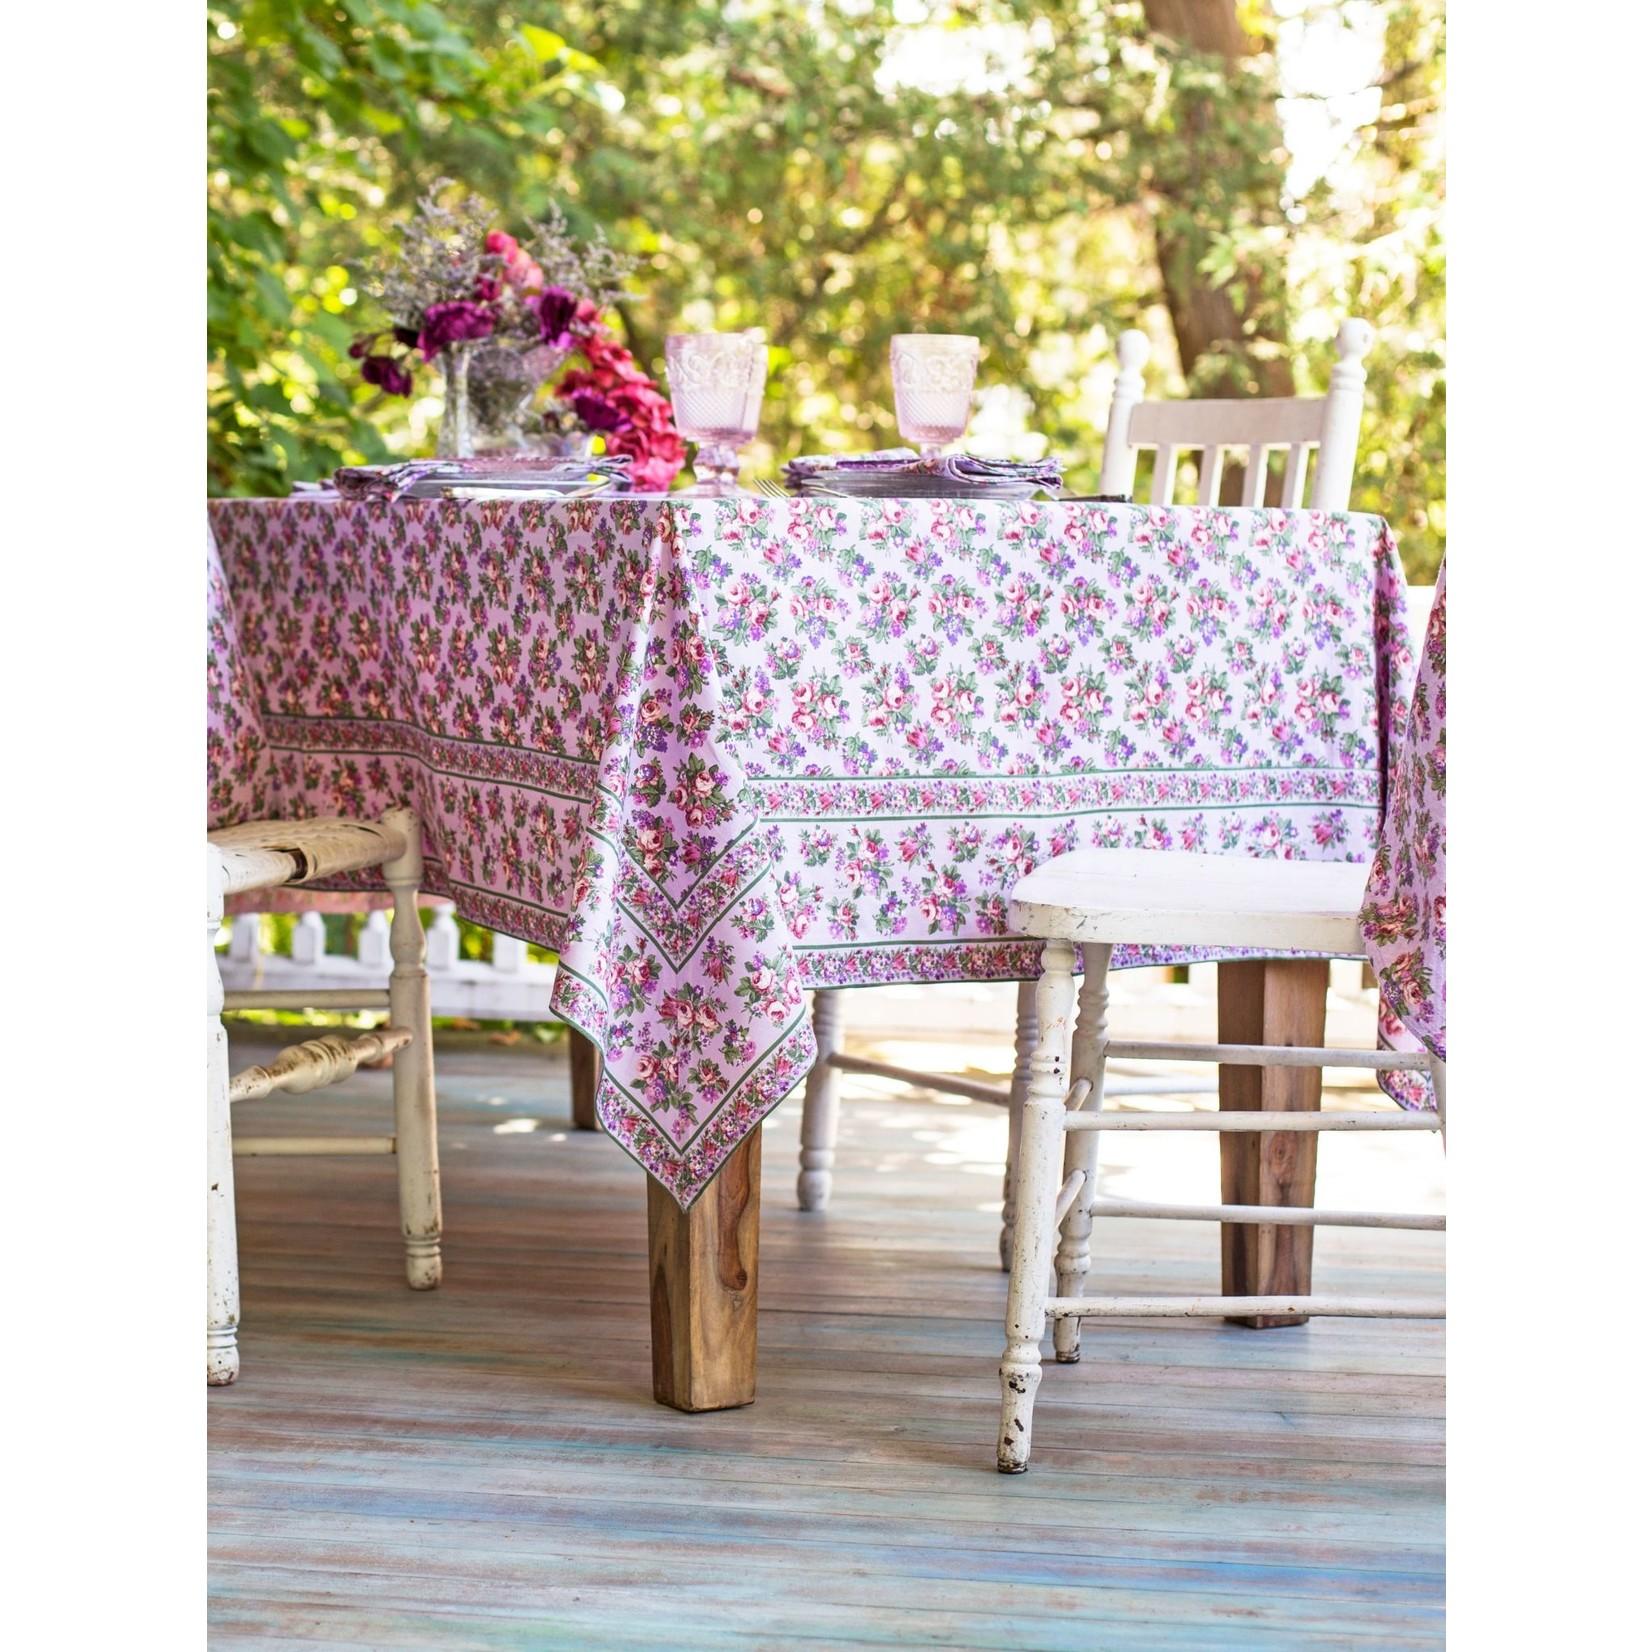 April Cornell Elizabeth's Garden Tablecloth - Lavender